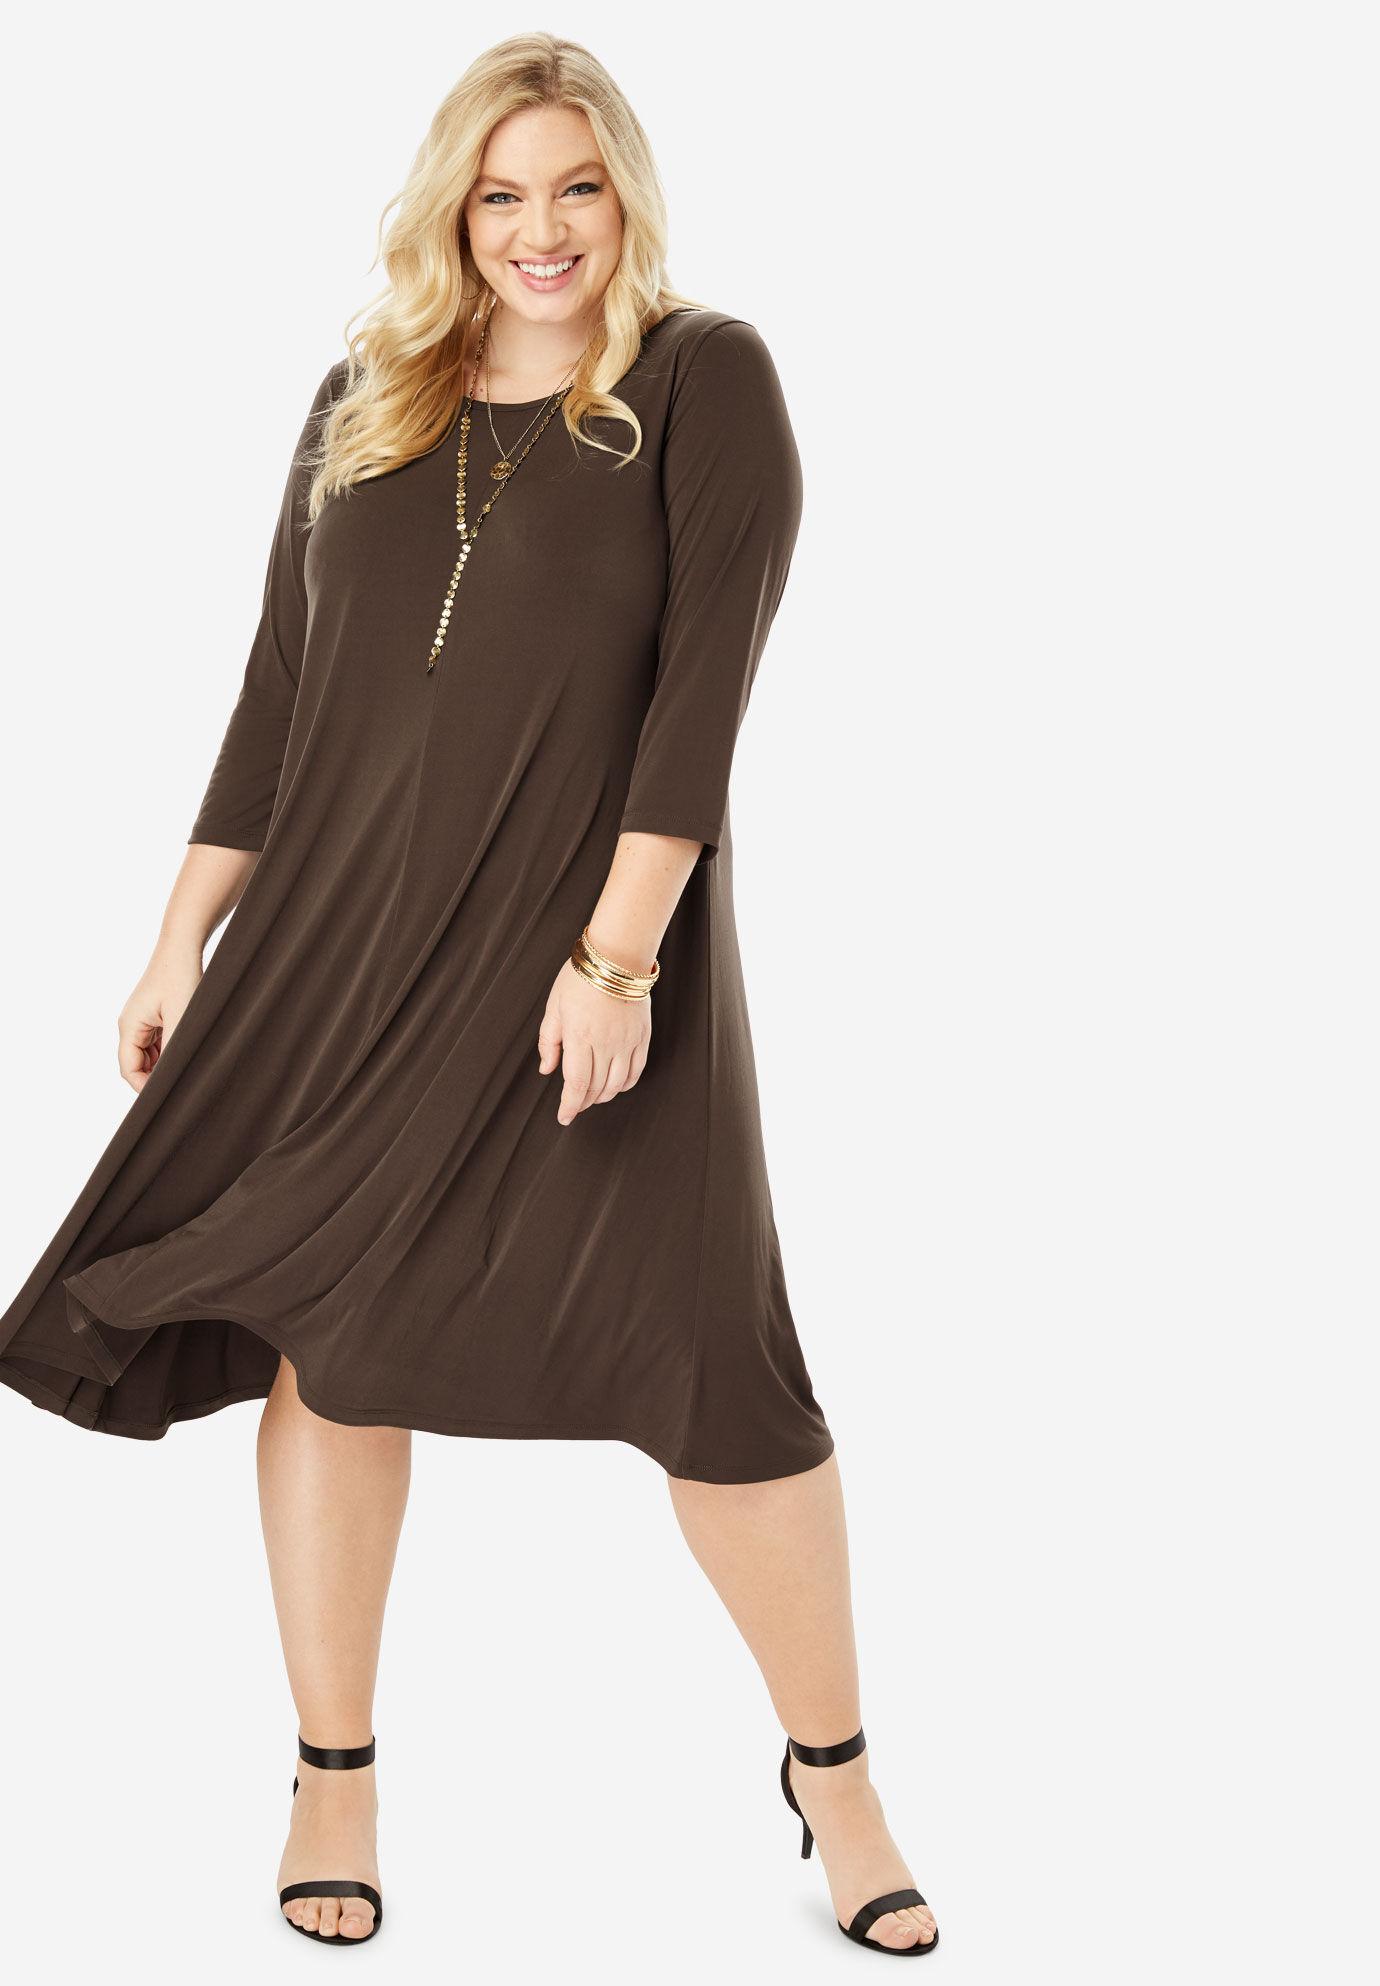 The Edge Plus Size Dresses